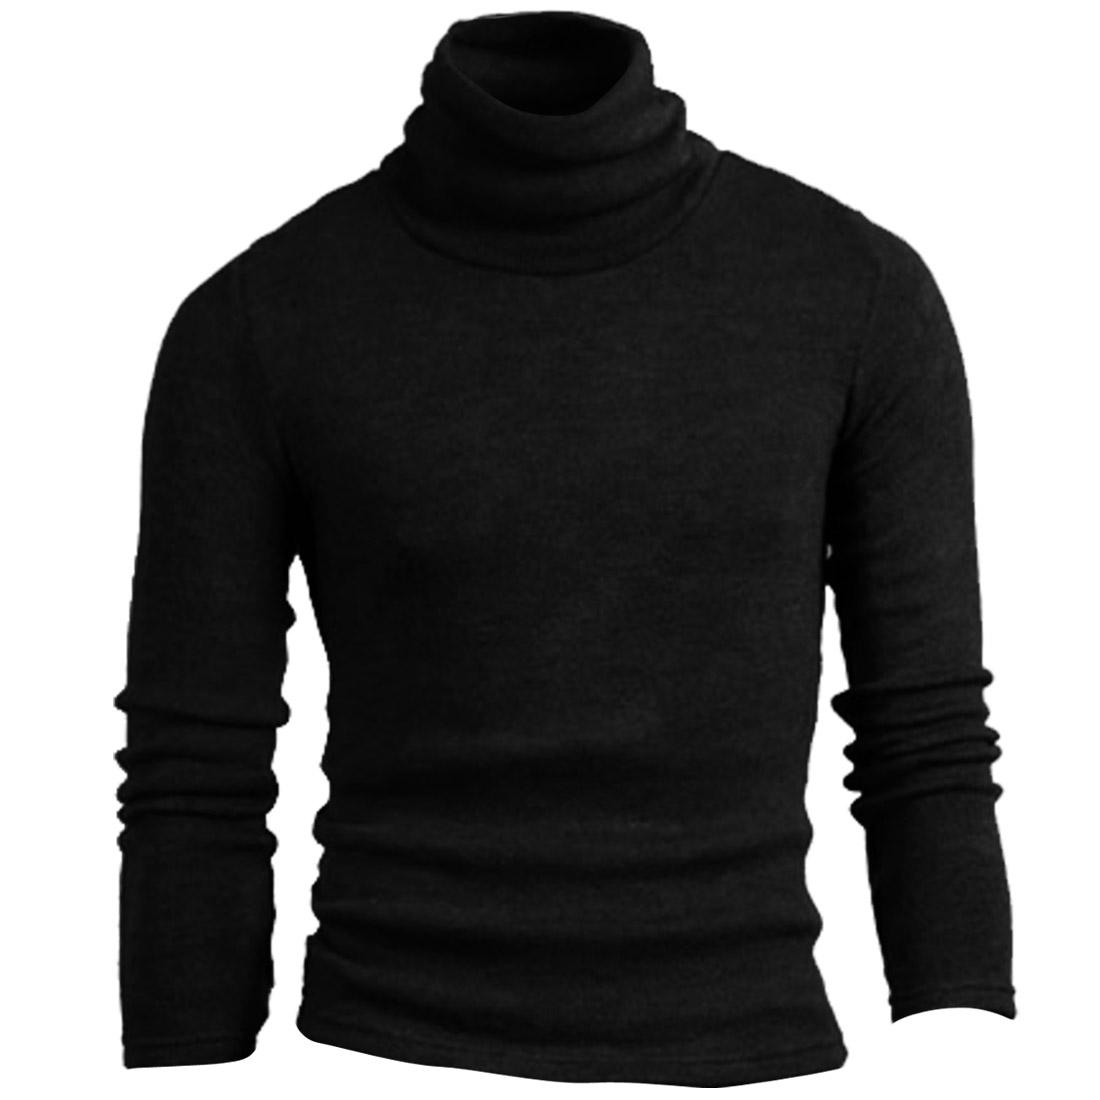 Men Long Sleeve Solid Color Pure Pattern Black Knit Shirt S